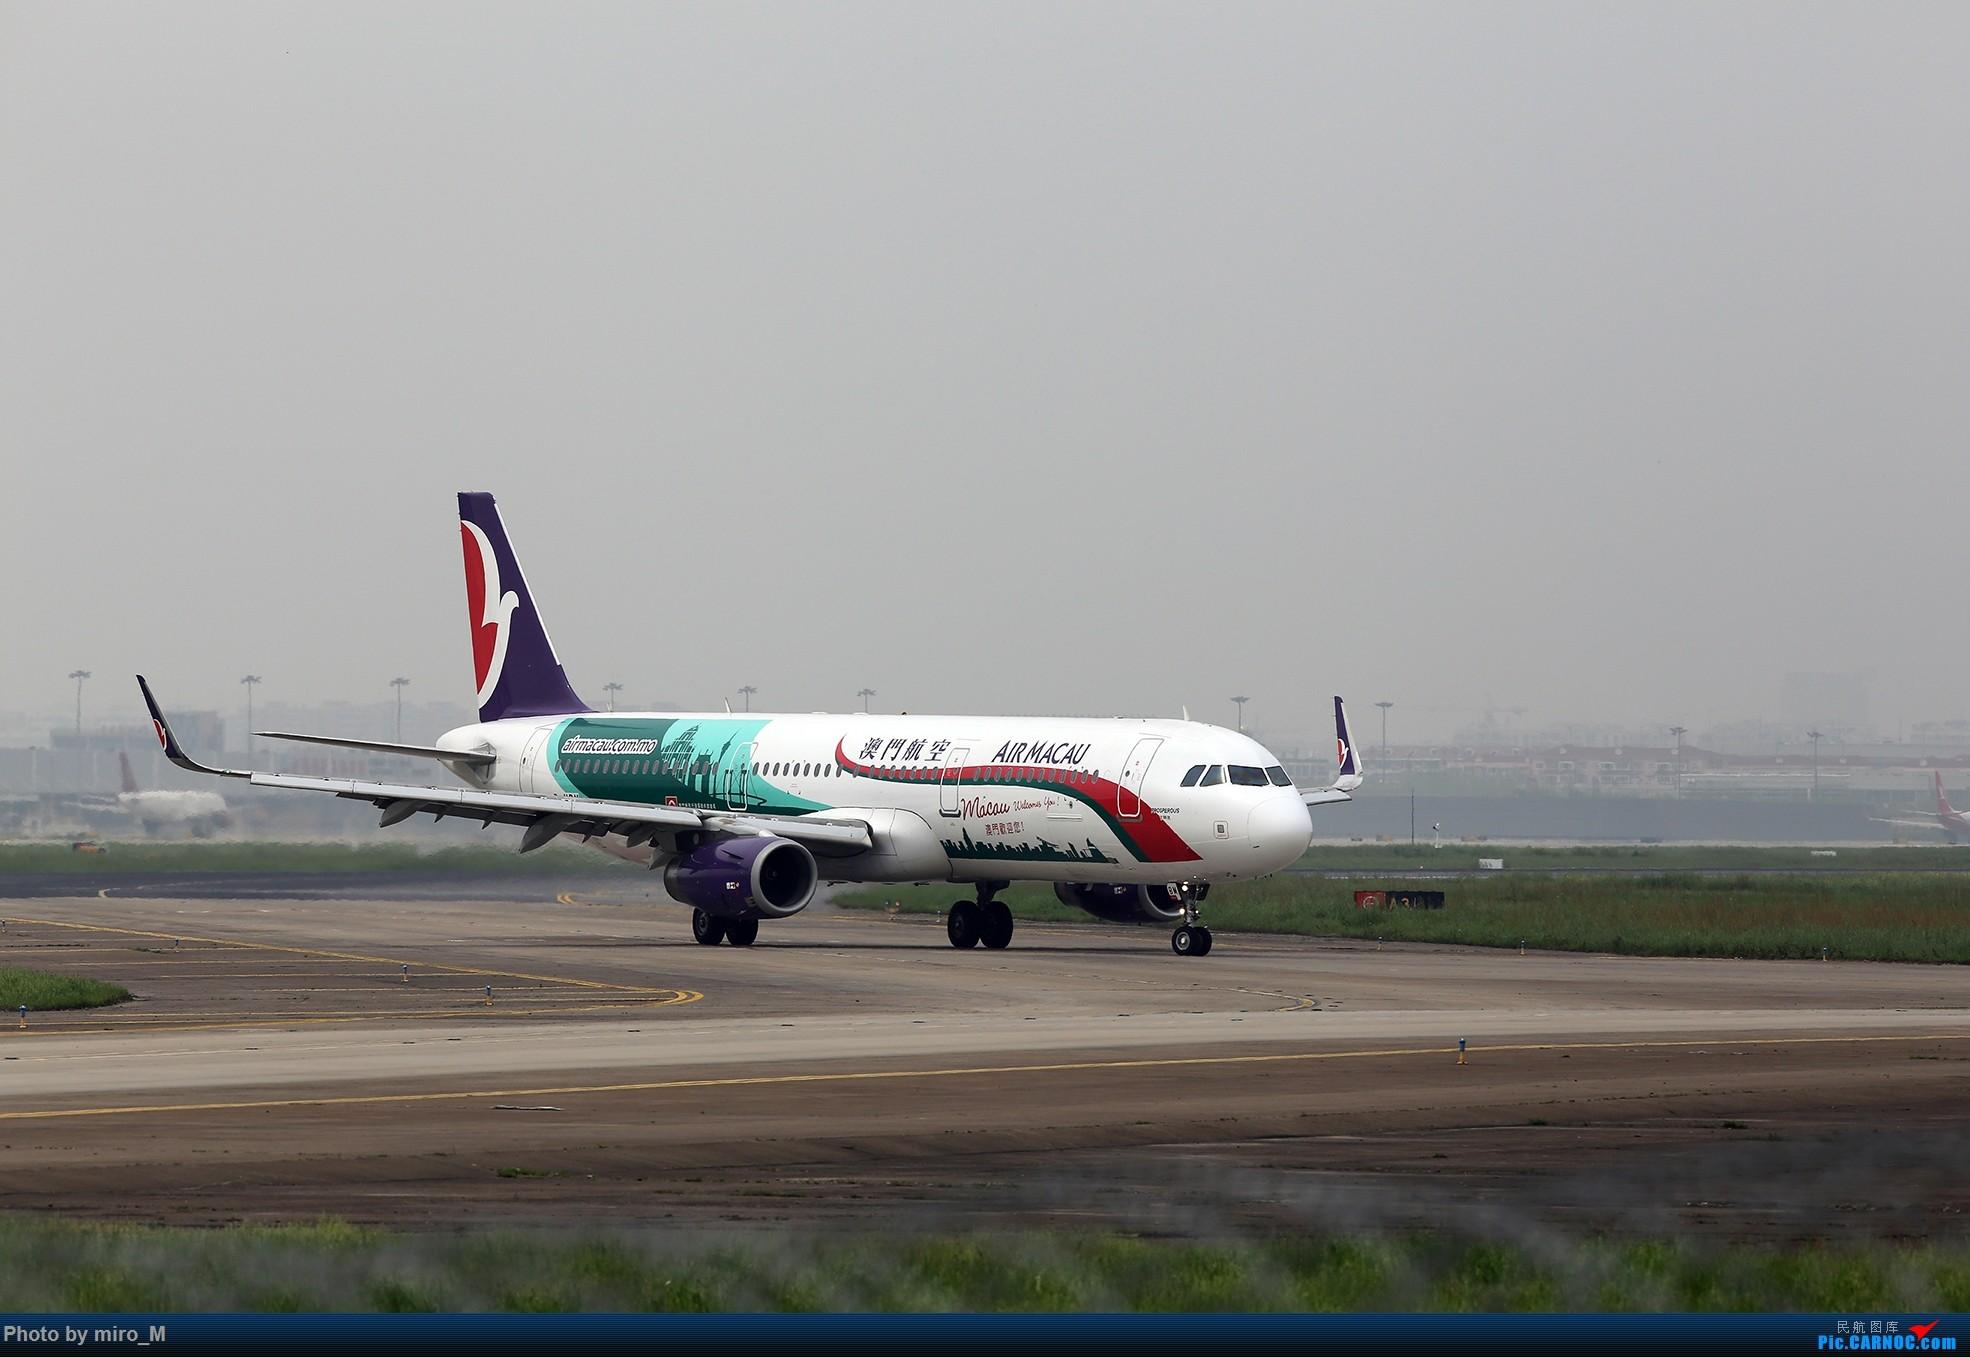 Re:[原创]烂天普通货………………虹桥412-414拍机合集 AIRBUS A321-200 B-MBM 中国上海虹桥国际机场